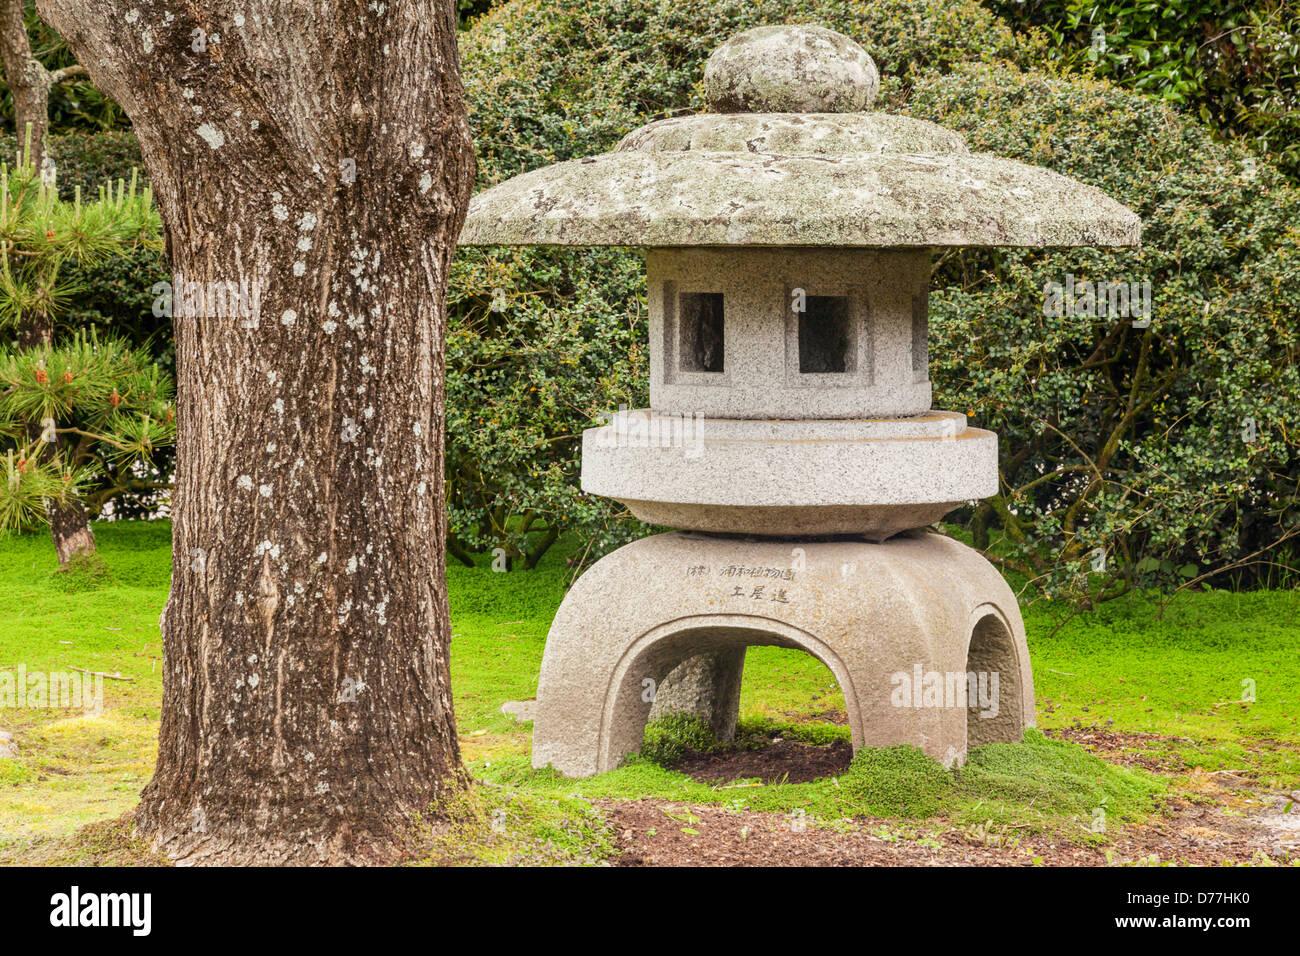 Ordinaire Stone Lantern, Japanese Garden Of Contemplation, Hamilton Gardens,  Hamilton, Waikato, New